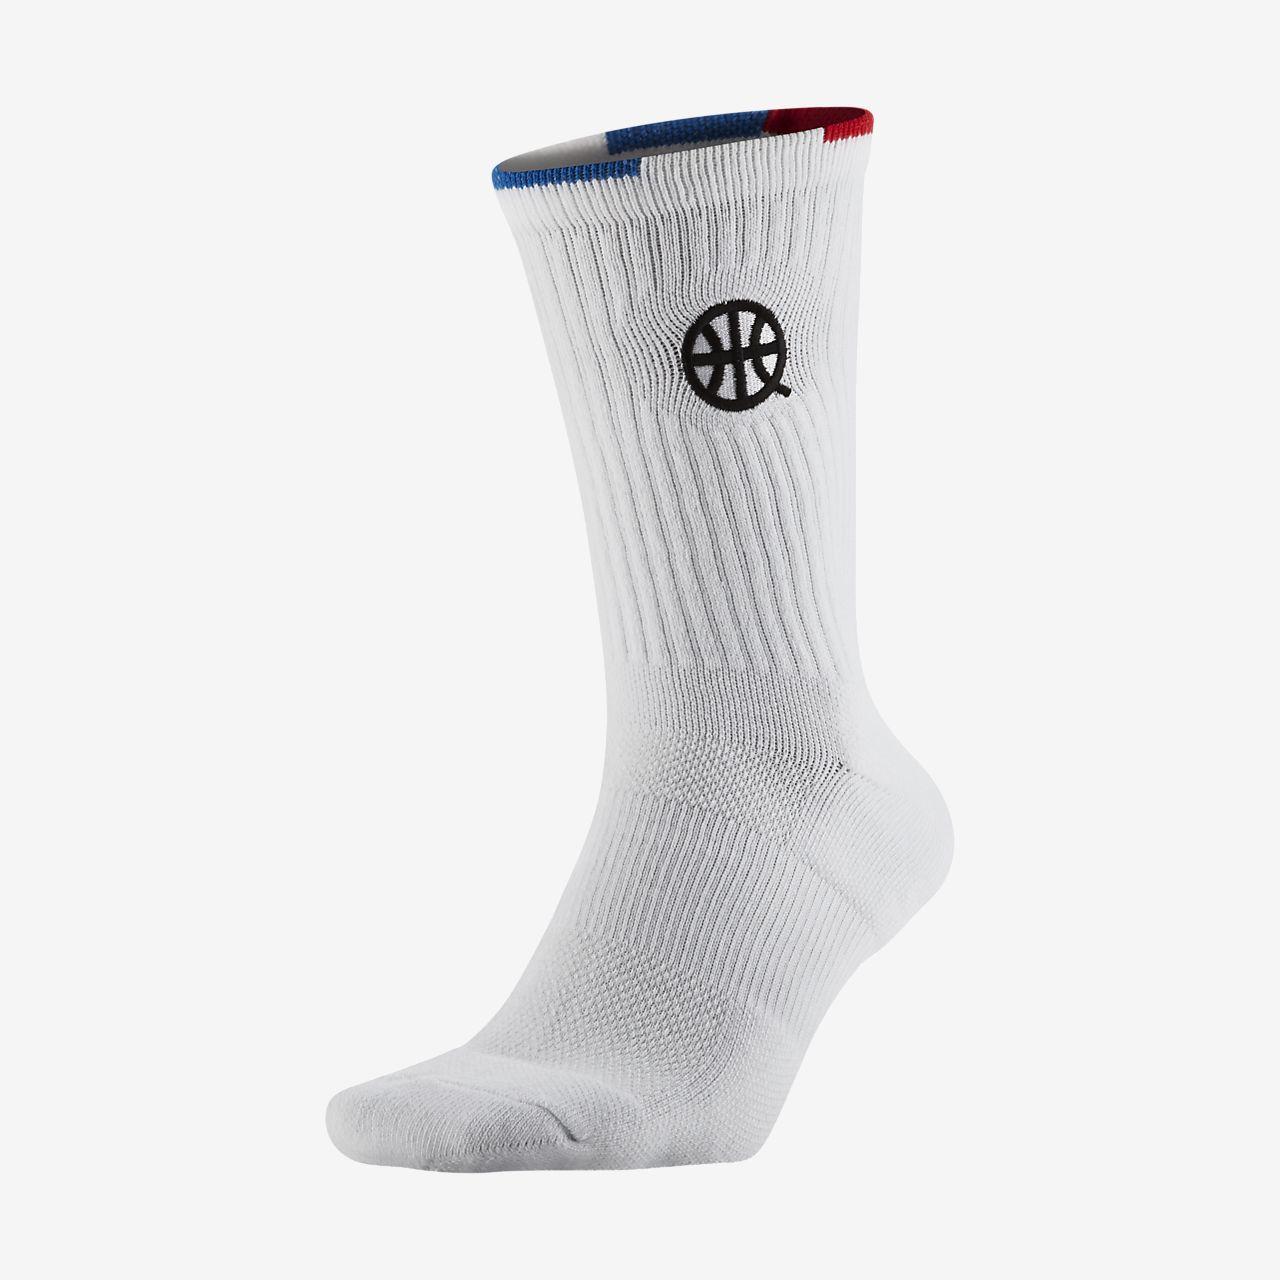 Jordan Quai54 rövidszárú zokni